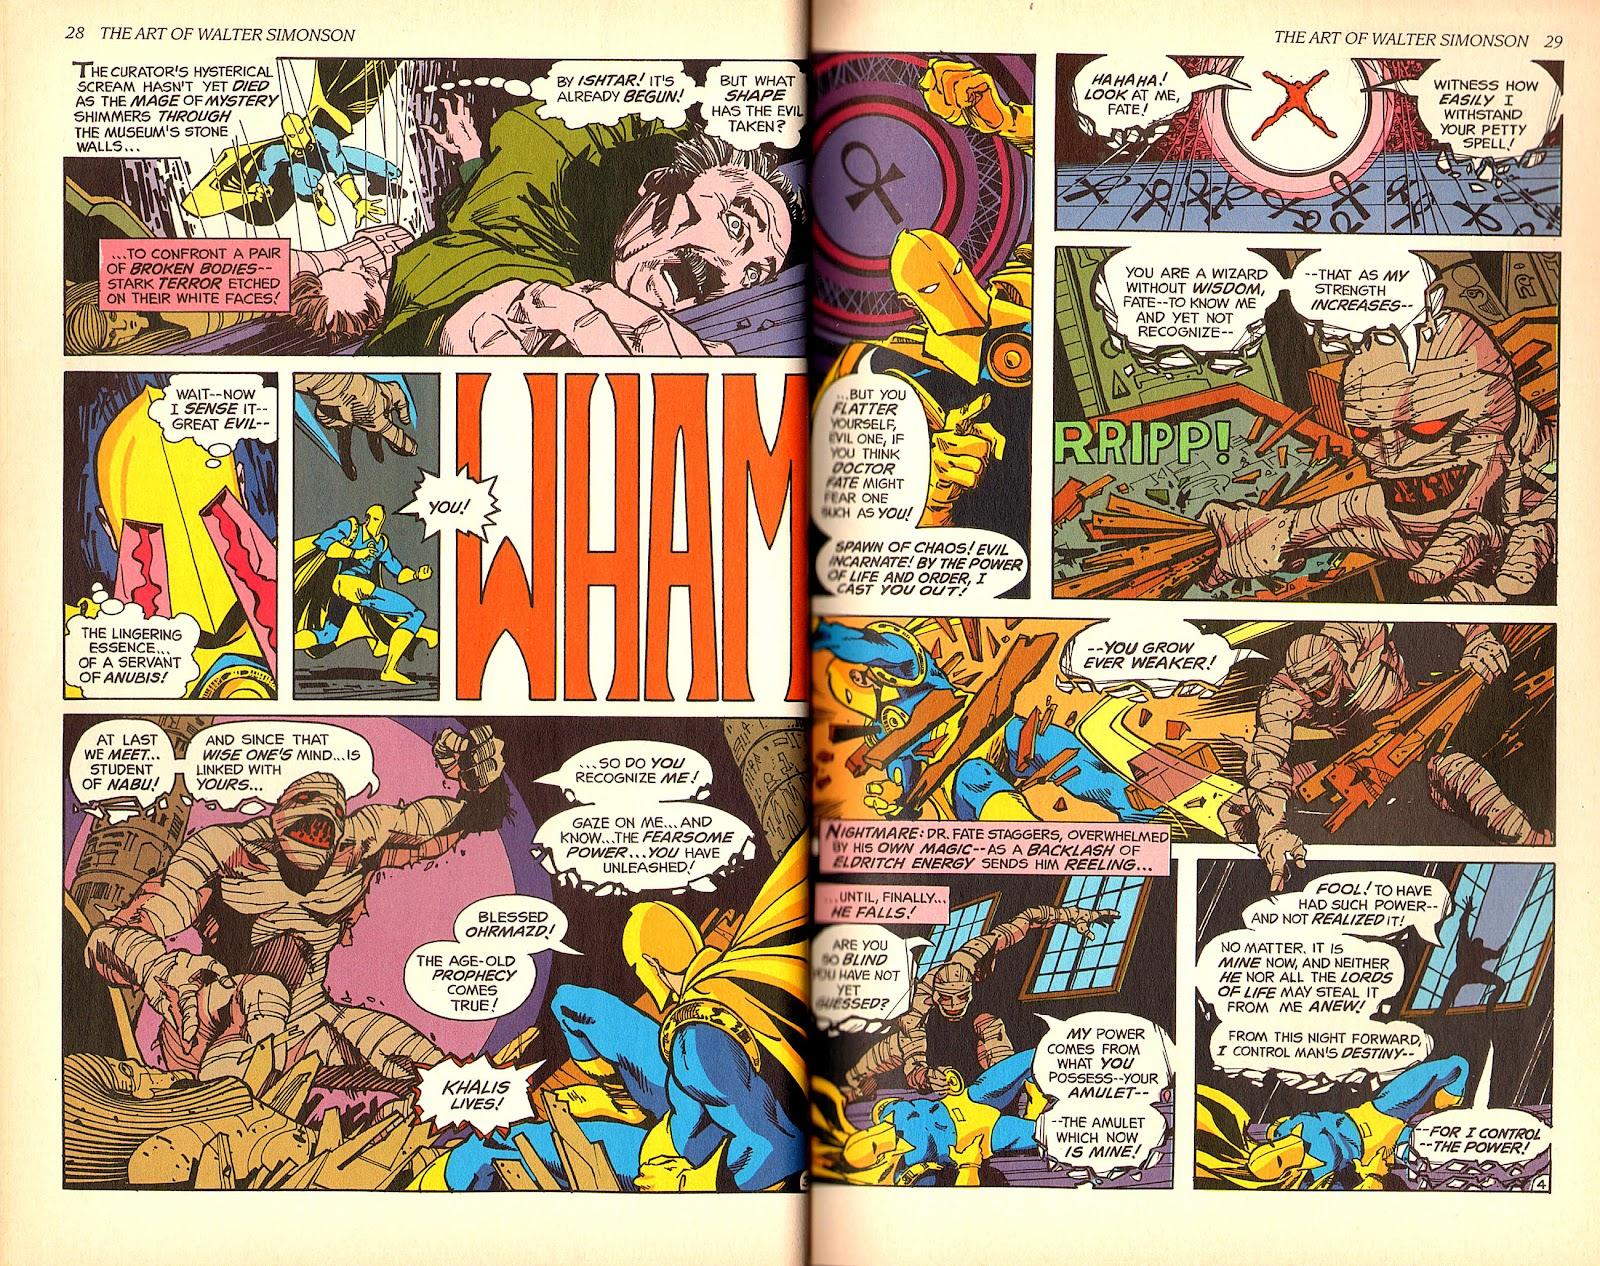 Read online The Art of Walter Simonson comic -  Issue # TPB - 16